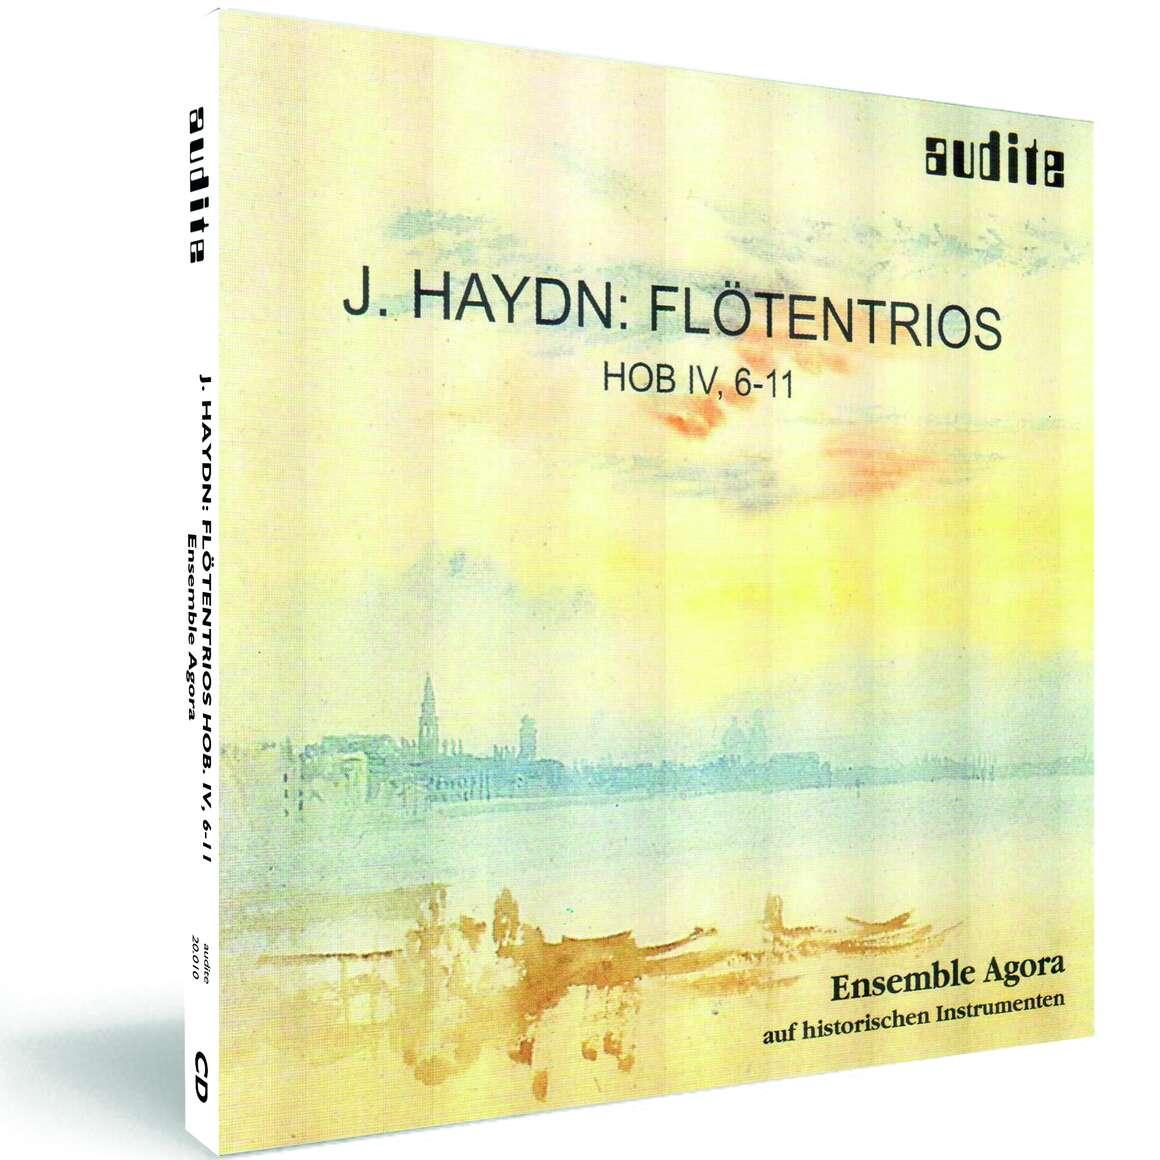 J. Haydn: Flute Trios Hob IV, Nos. 6-11